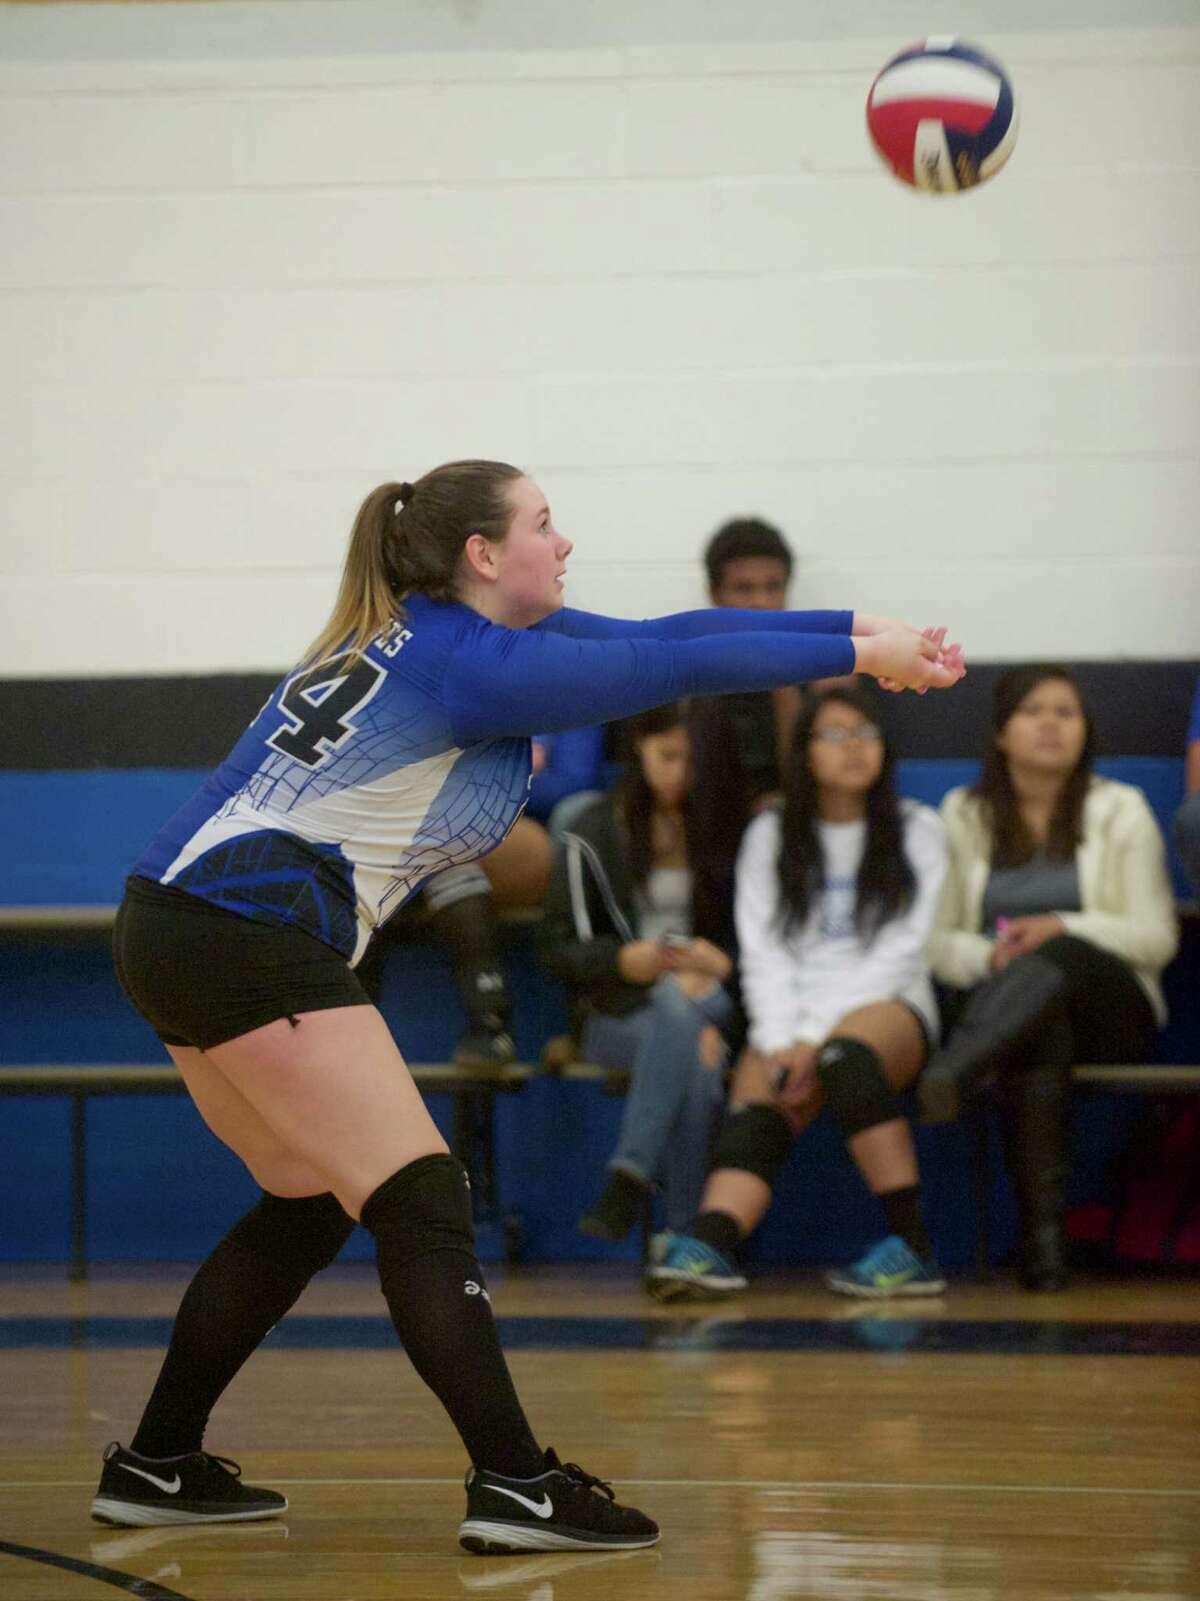 Tech's Amber Horvath (24) returns a serve during the girls high school volleyball game between Bullard Haven and Abbott Tech, on Wednesday, September 24, 2014, in Danbury, Conn.